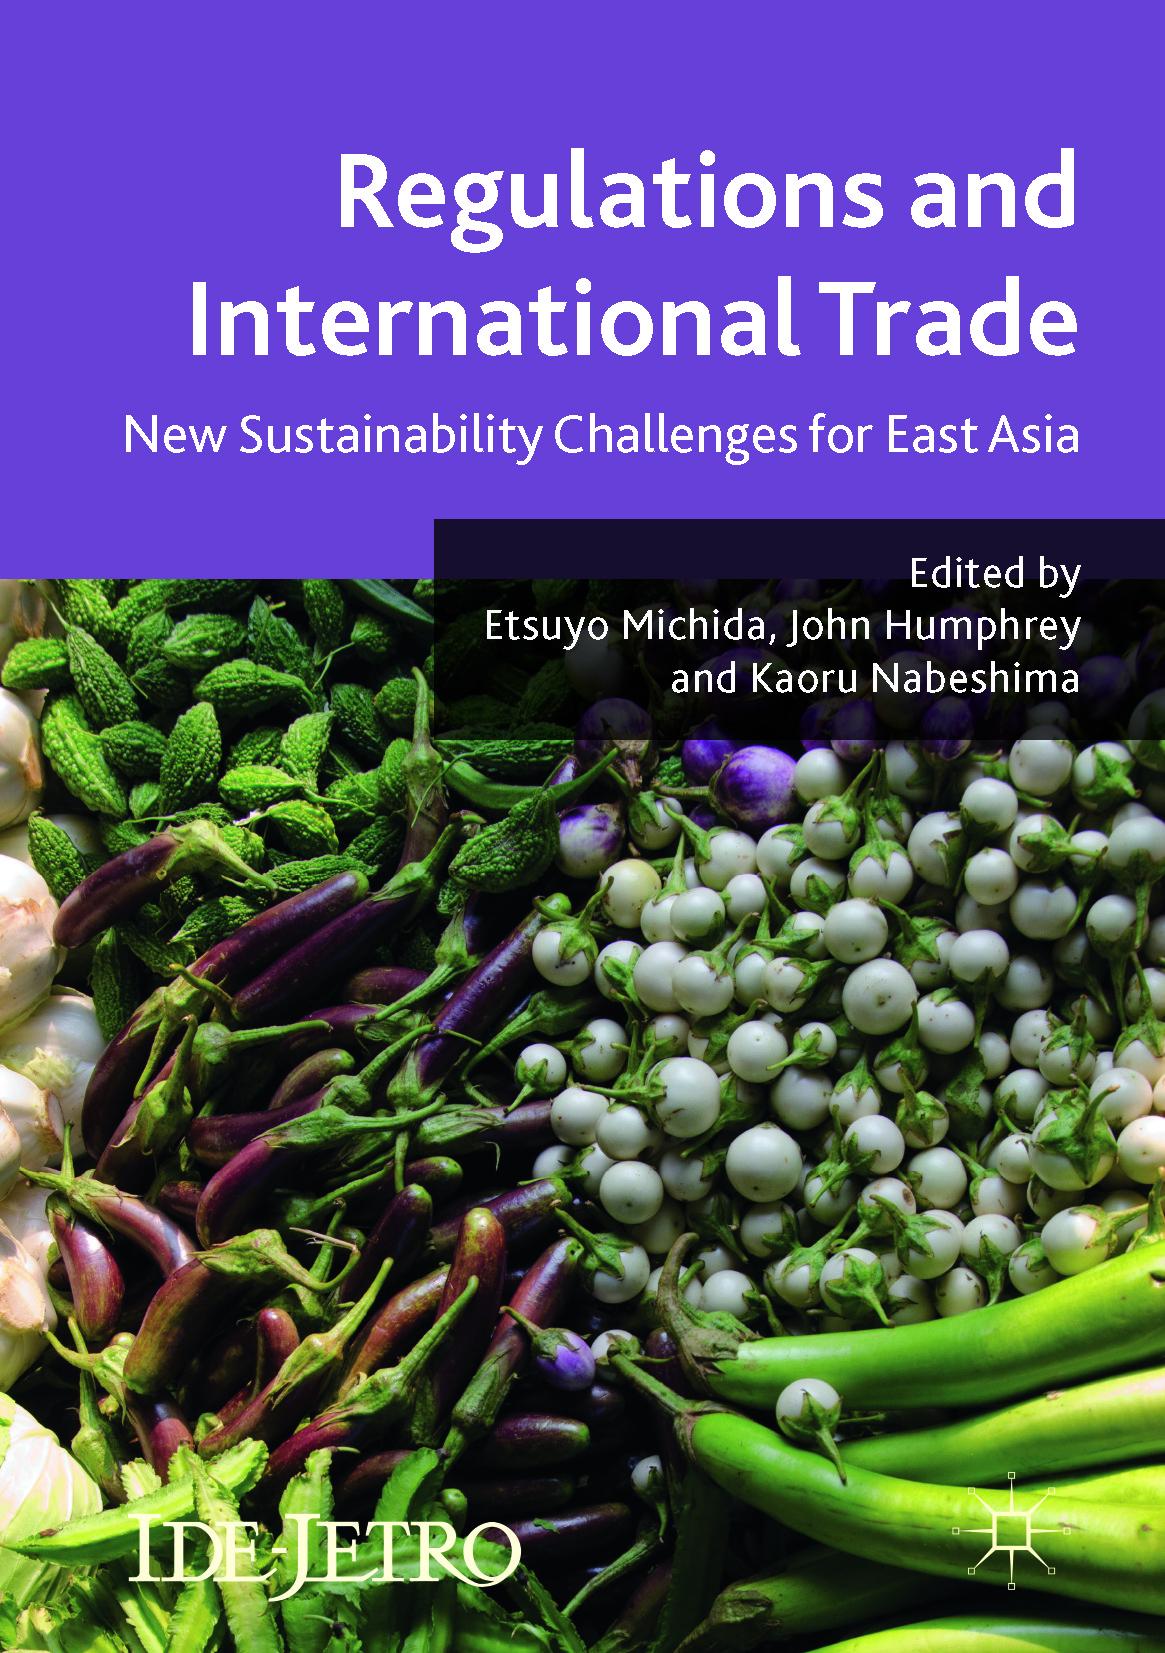 Humphrey, John - Regulations and International Trade, ebook